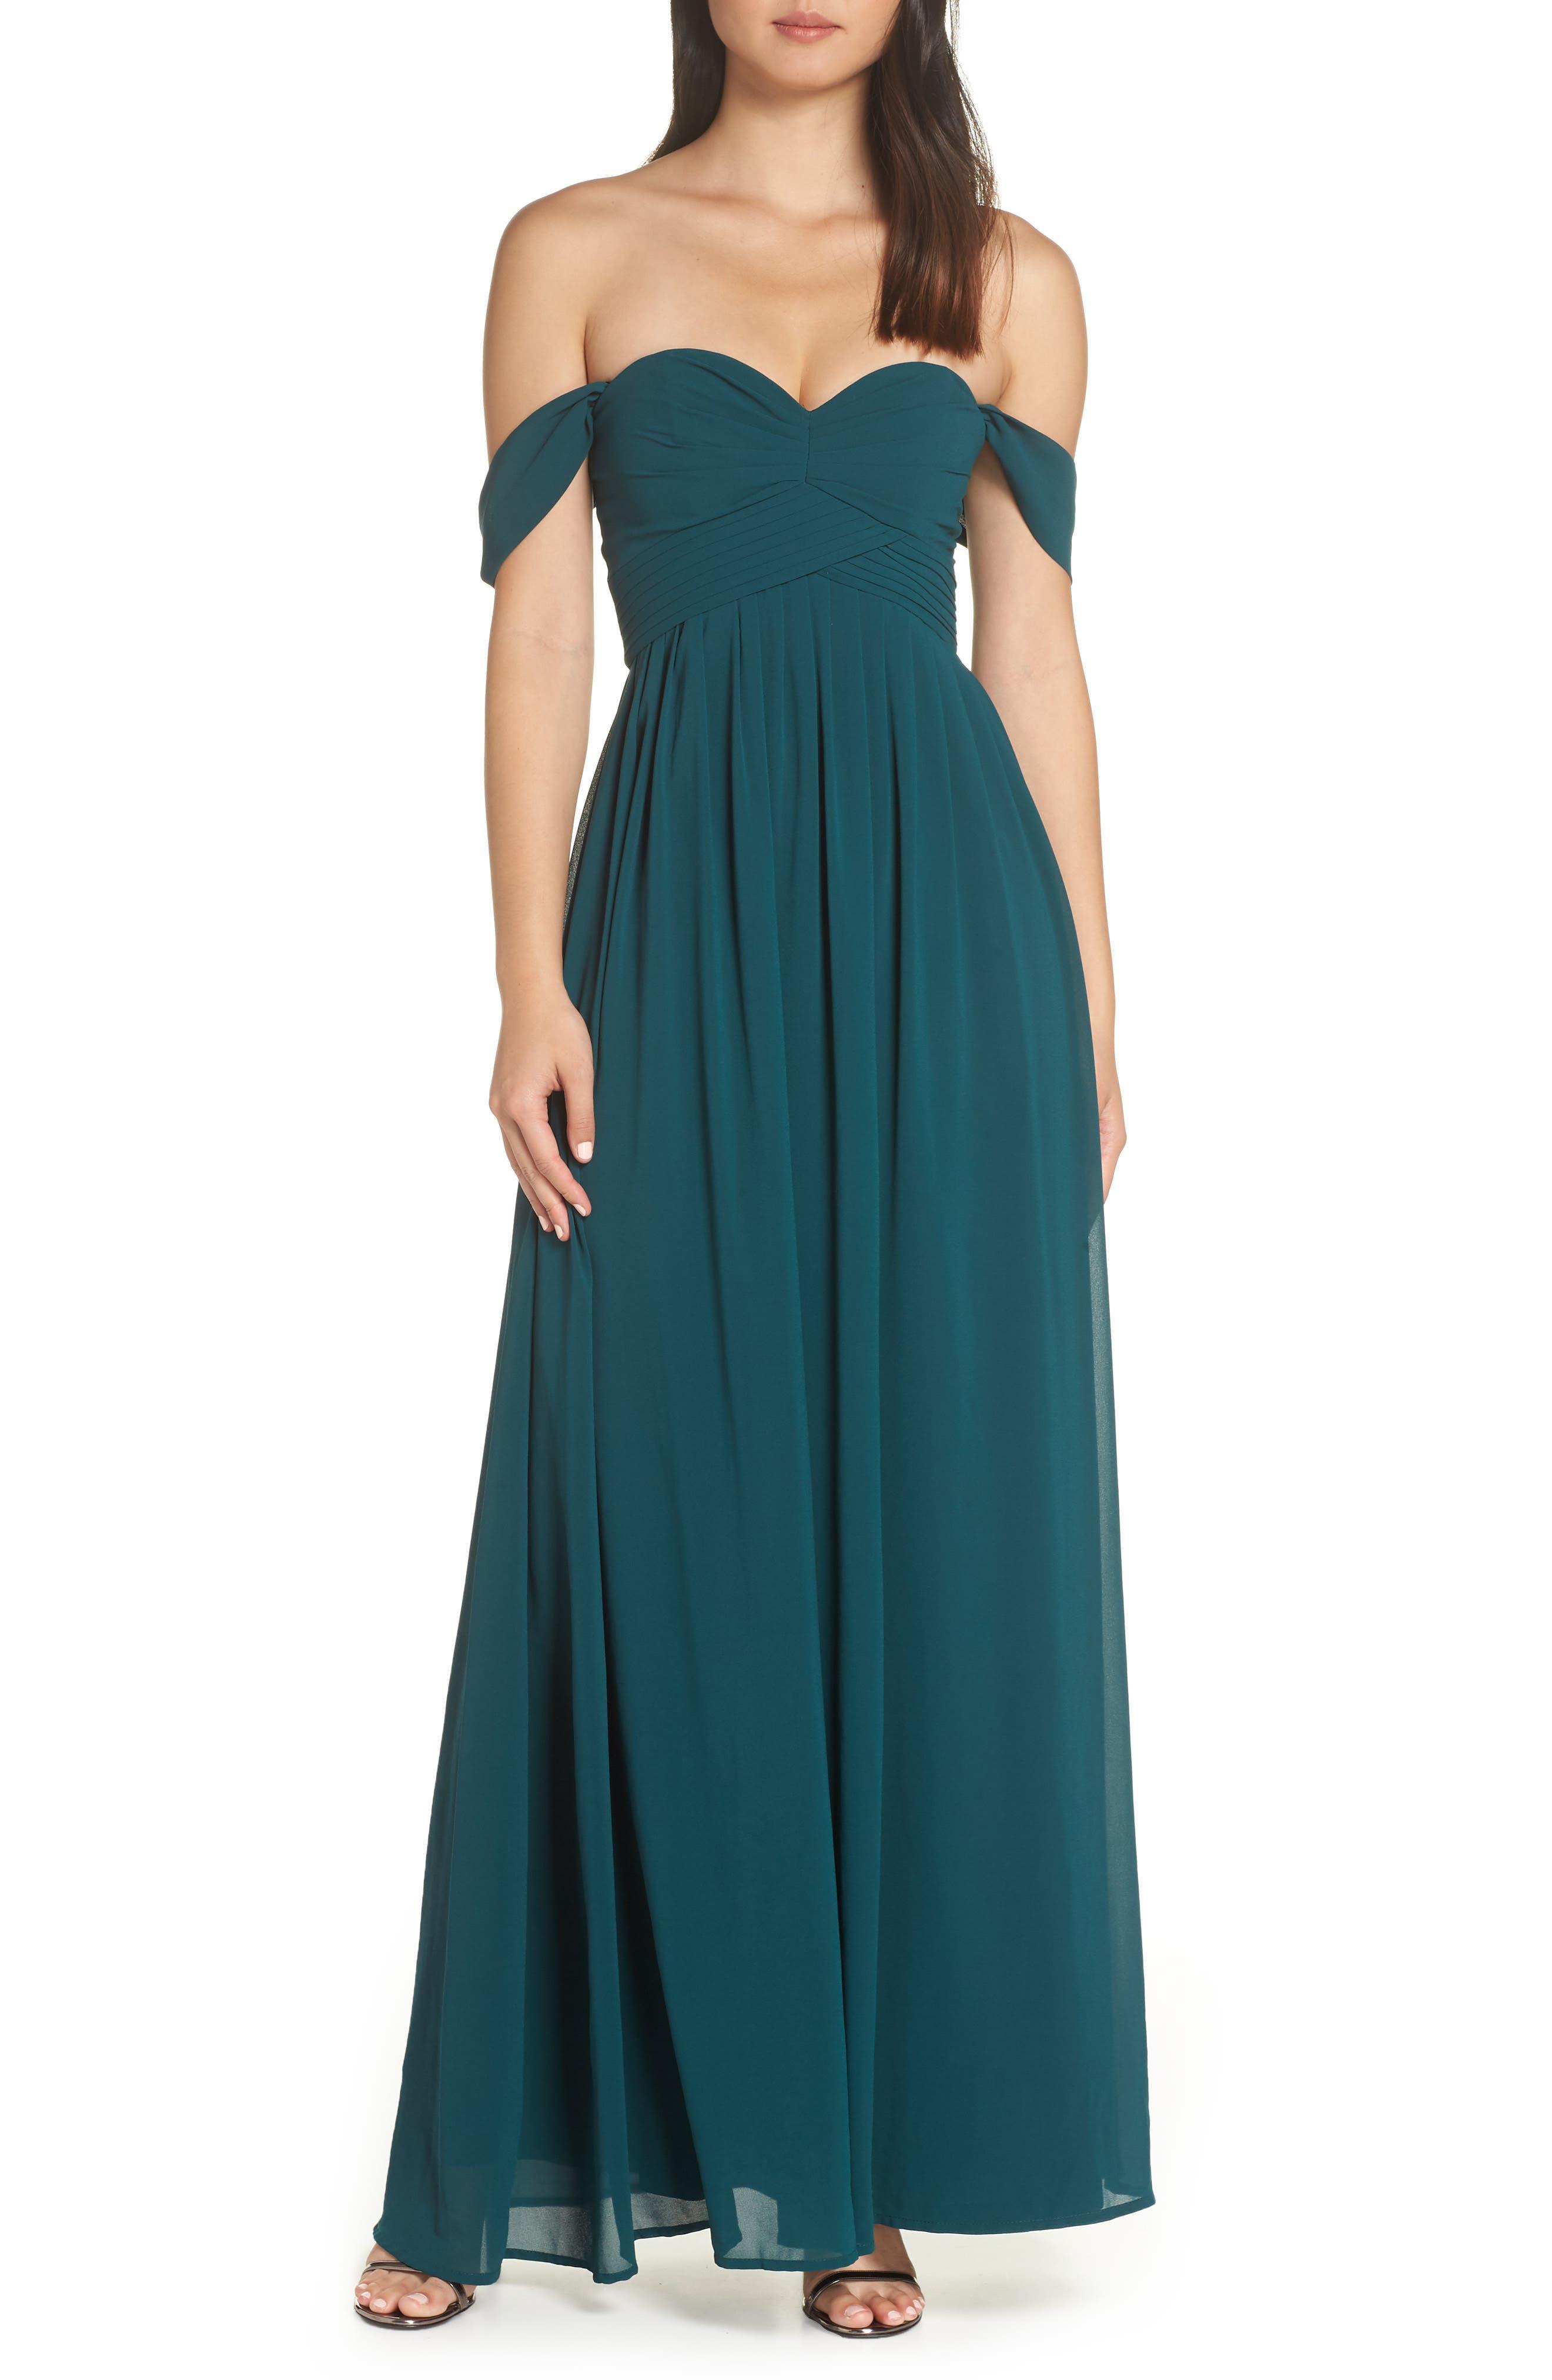 LULUS, Convertible Neckline Chiffon Gown, Main thumbnail 1, color, DEEP EMERALD